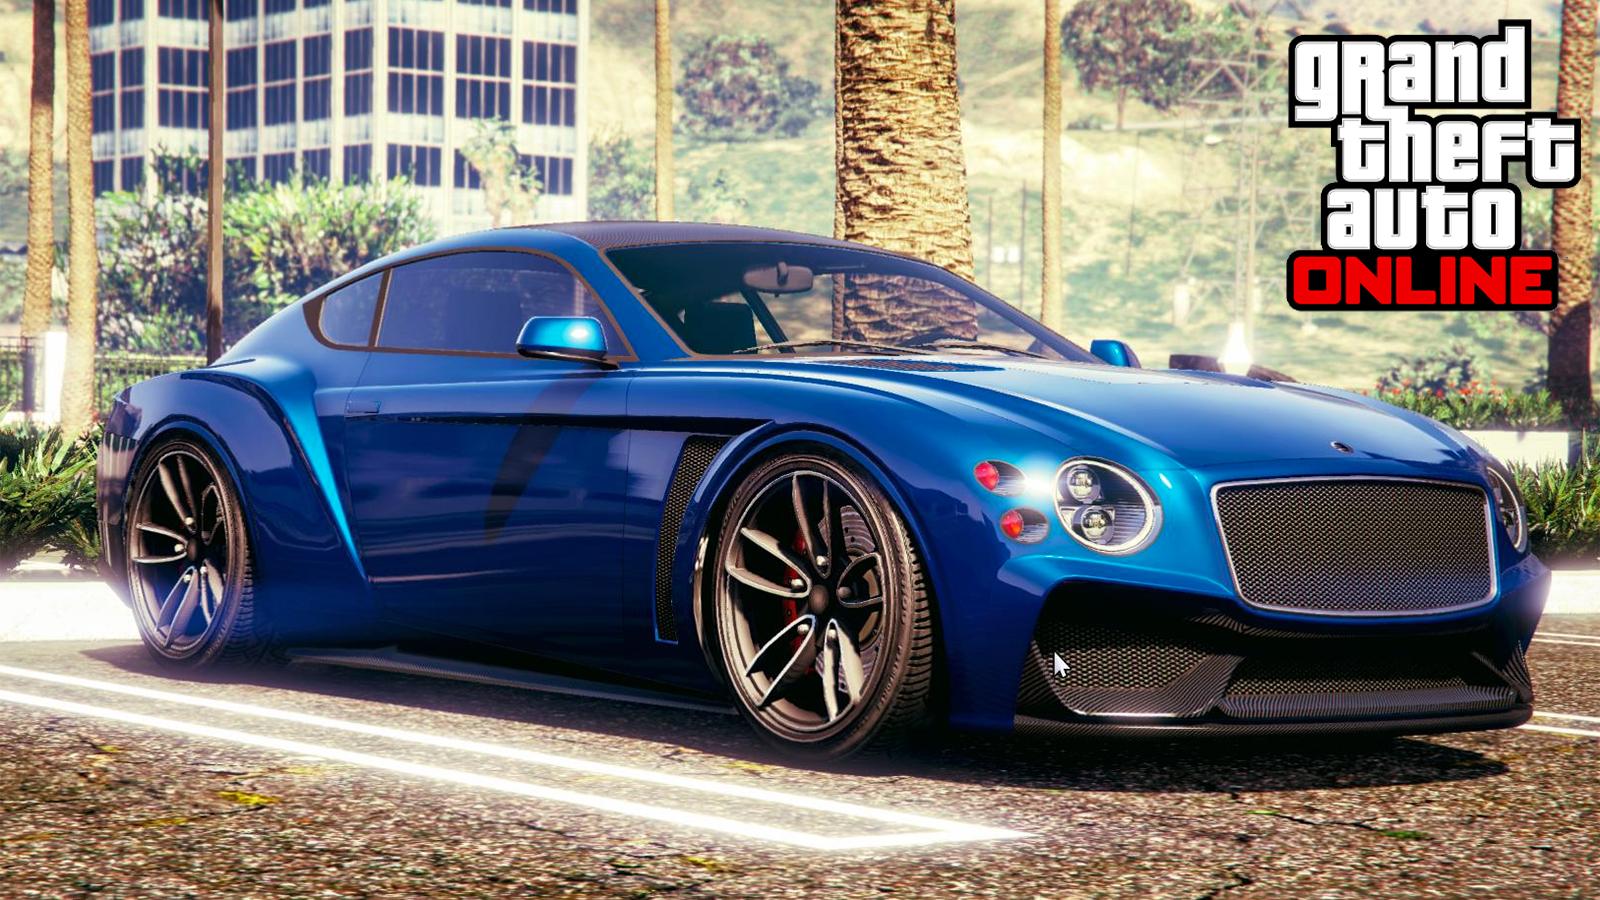 GTA Online Car